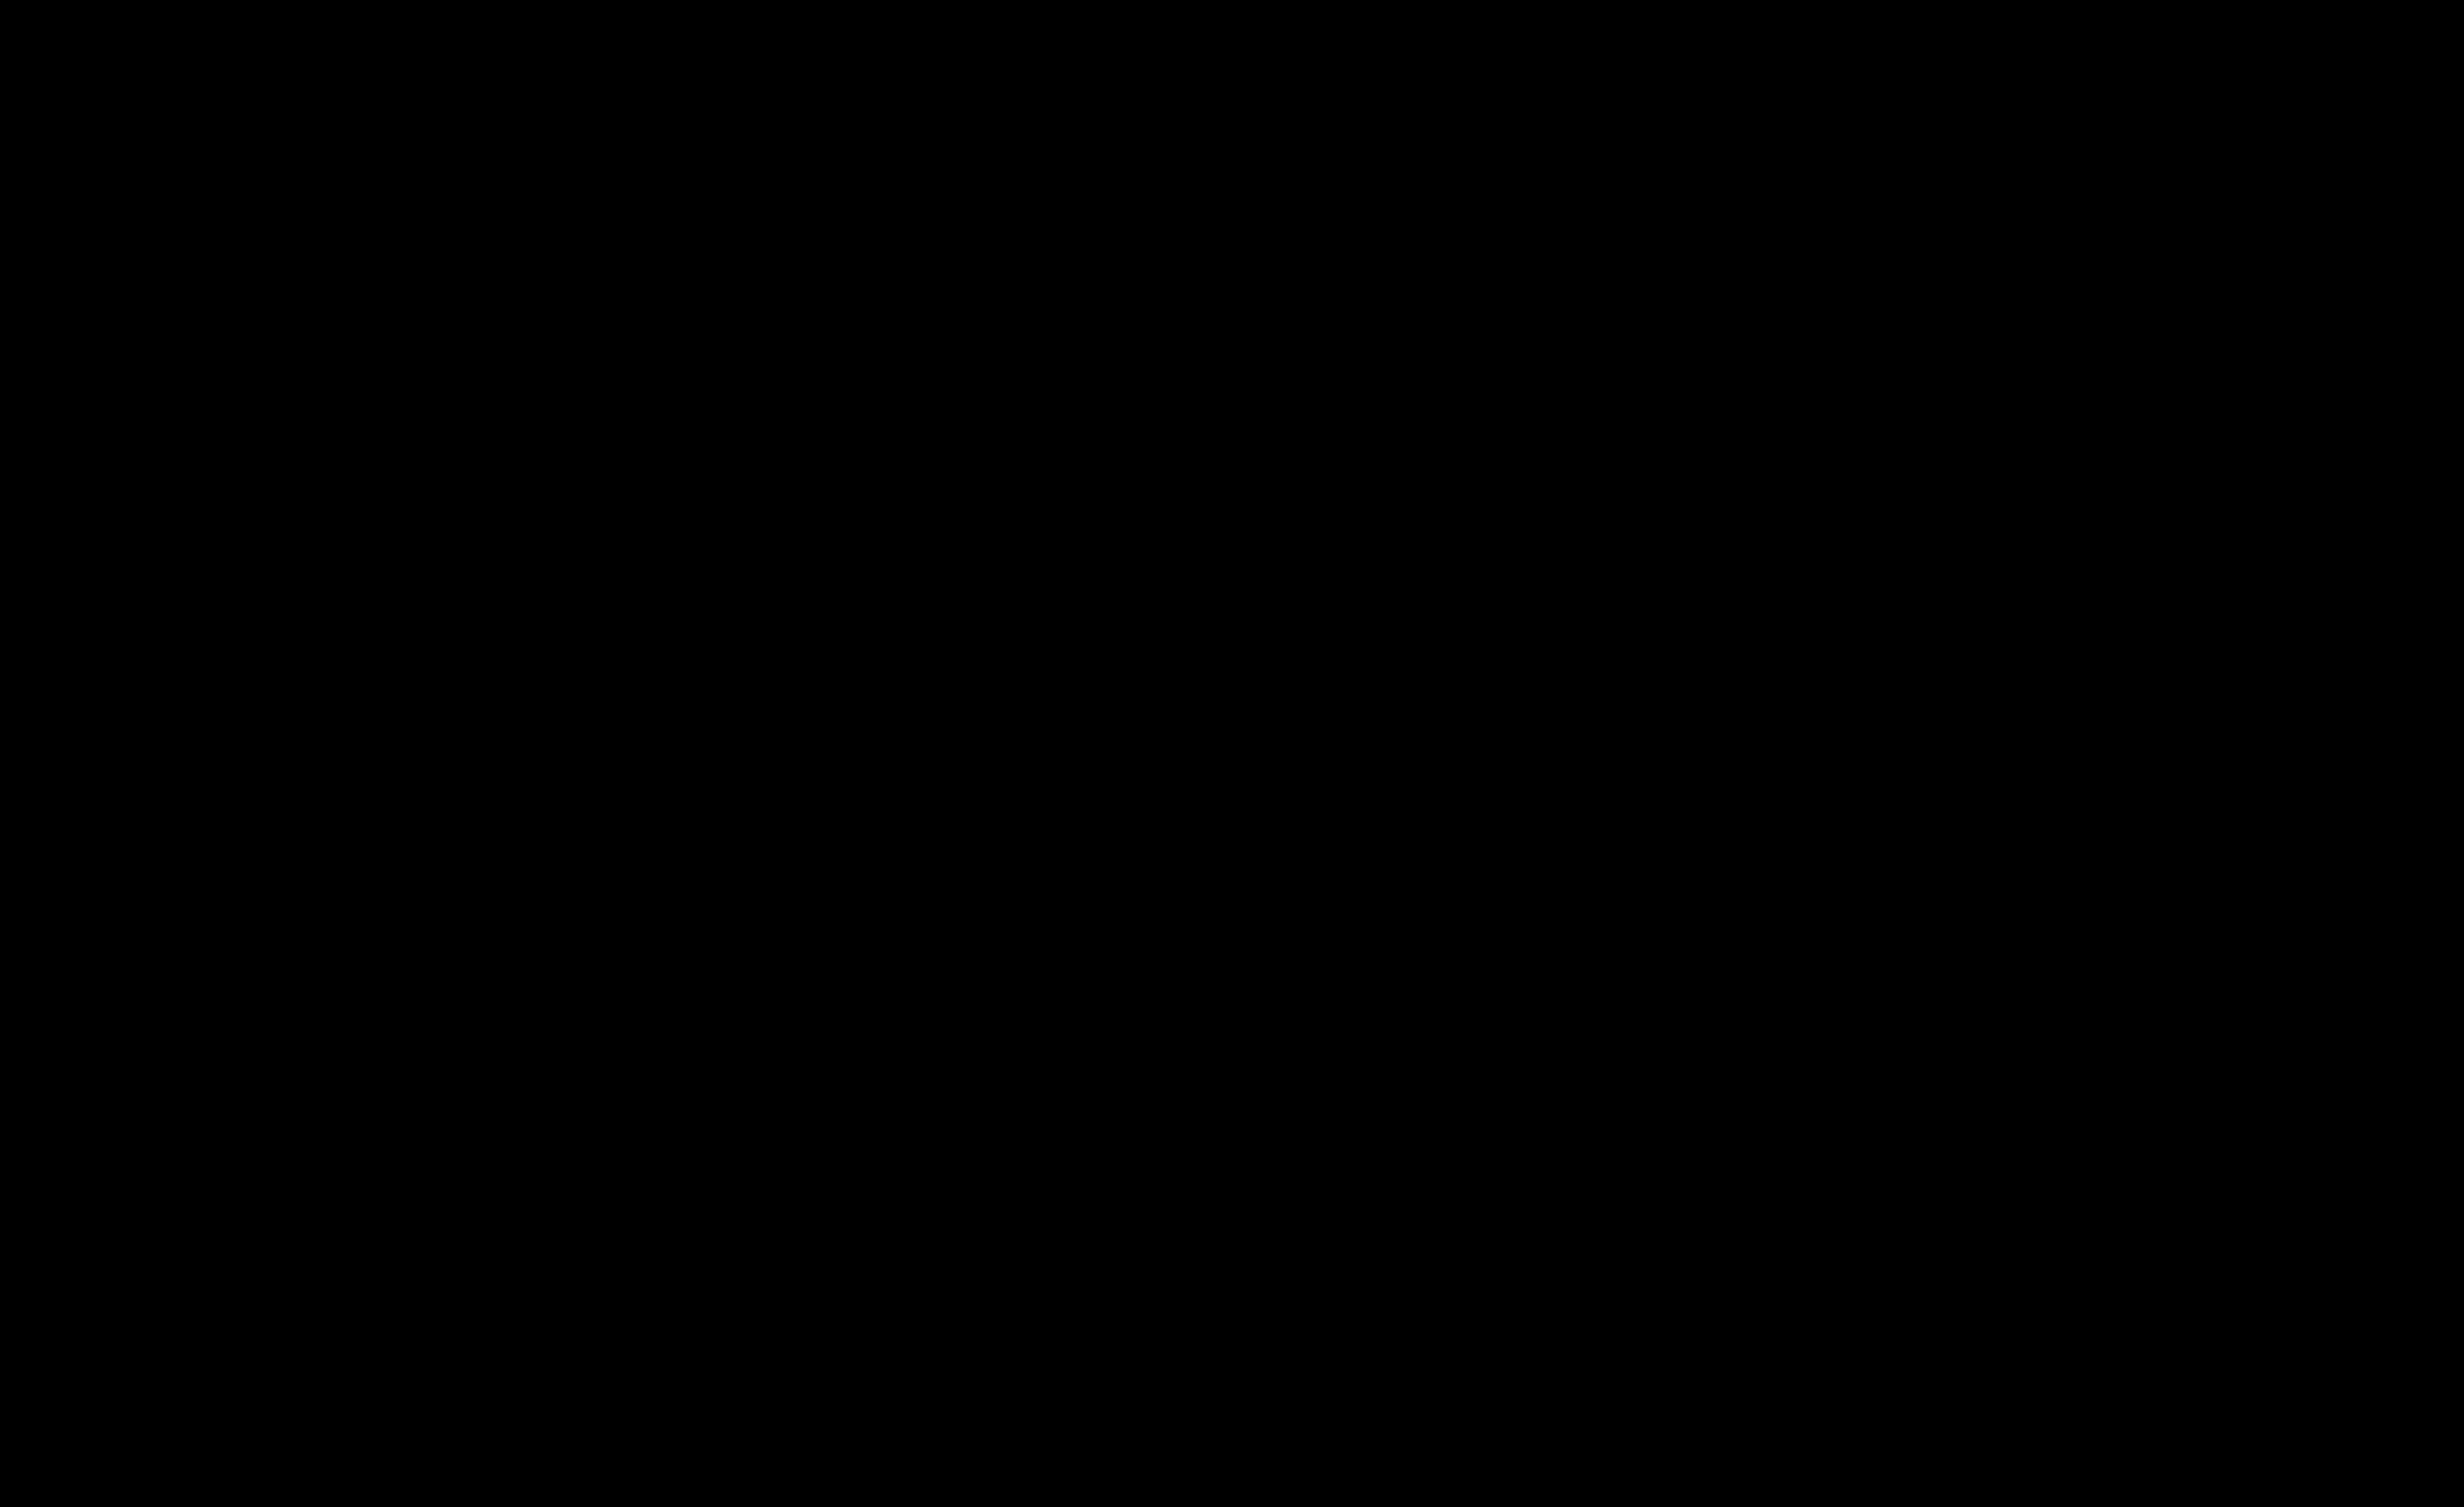 PNG HD Musical Notes Symbols - 131625